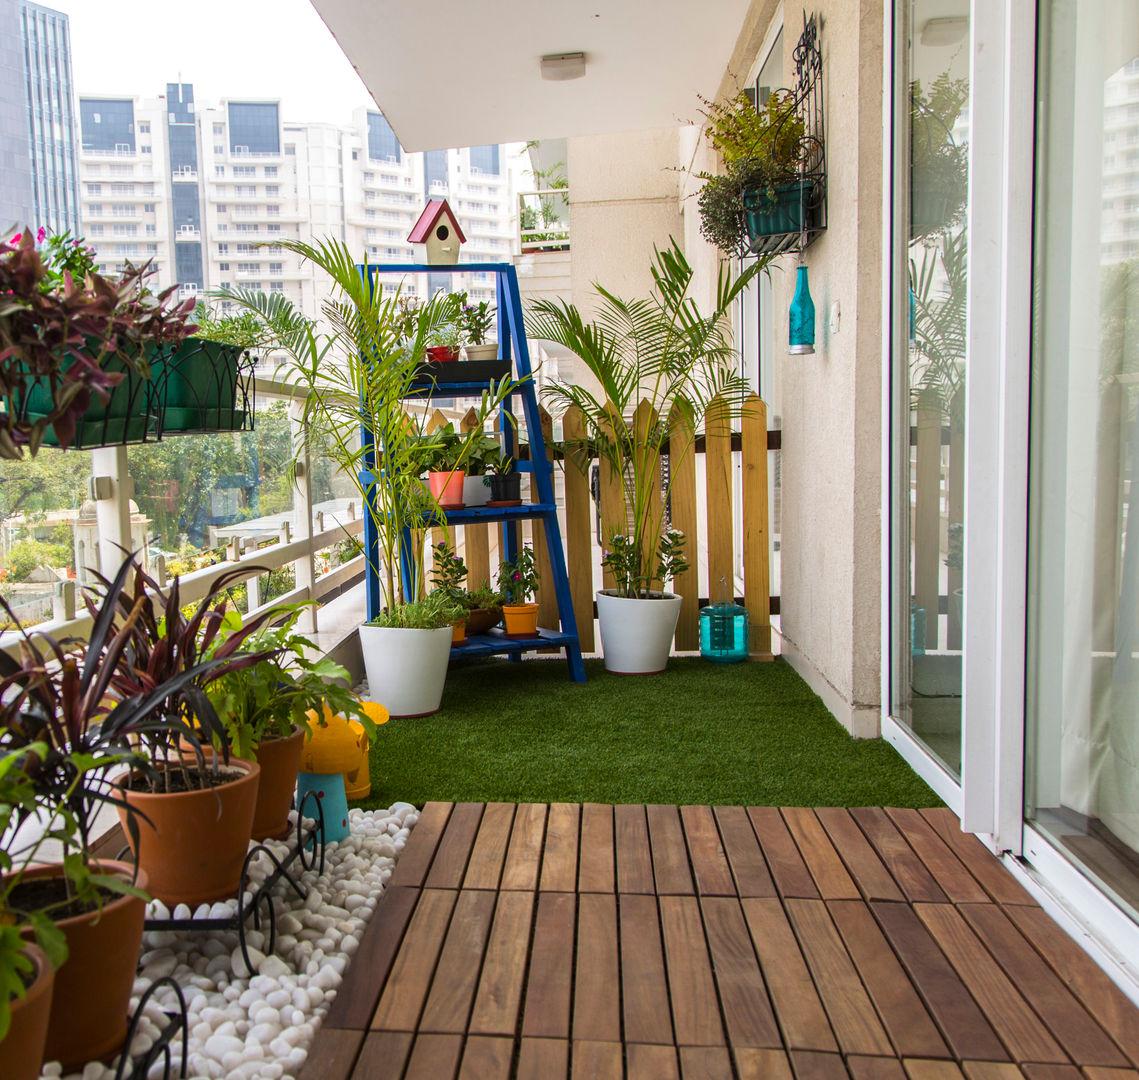 Terrace design ideas inspiration images homify